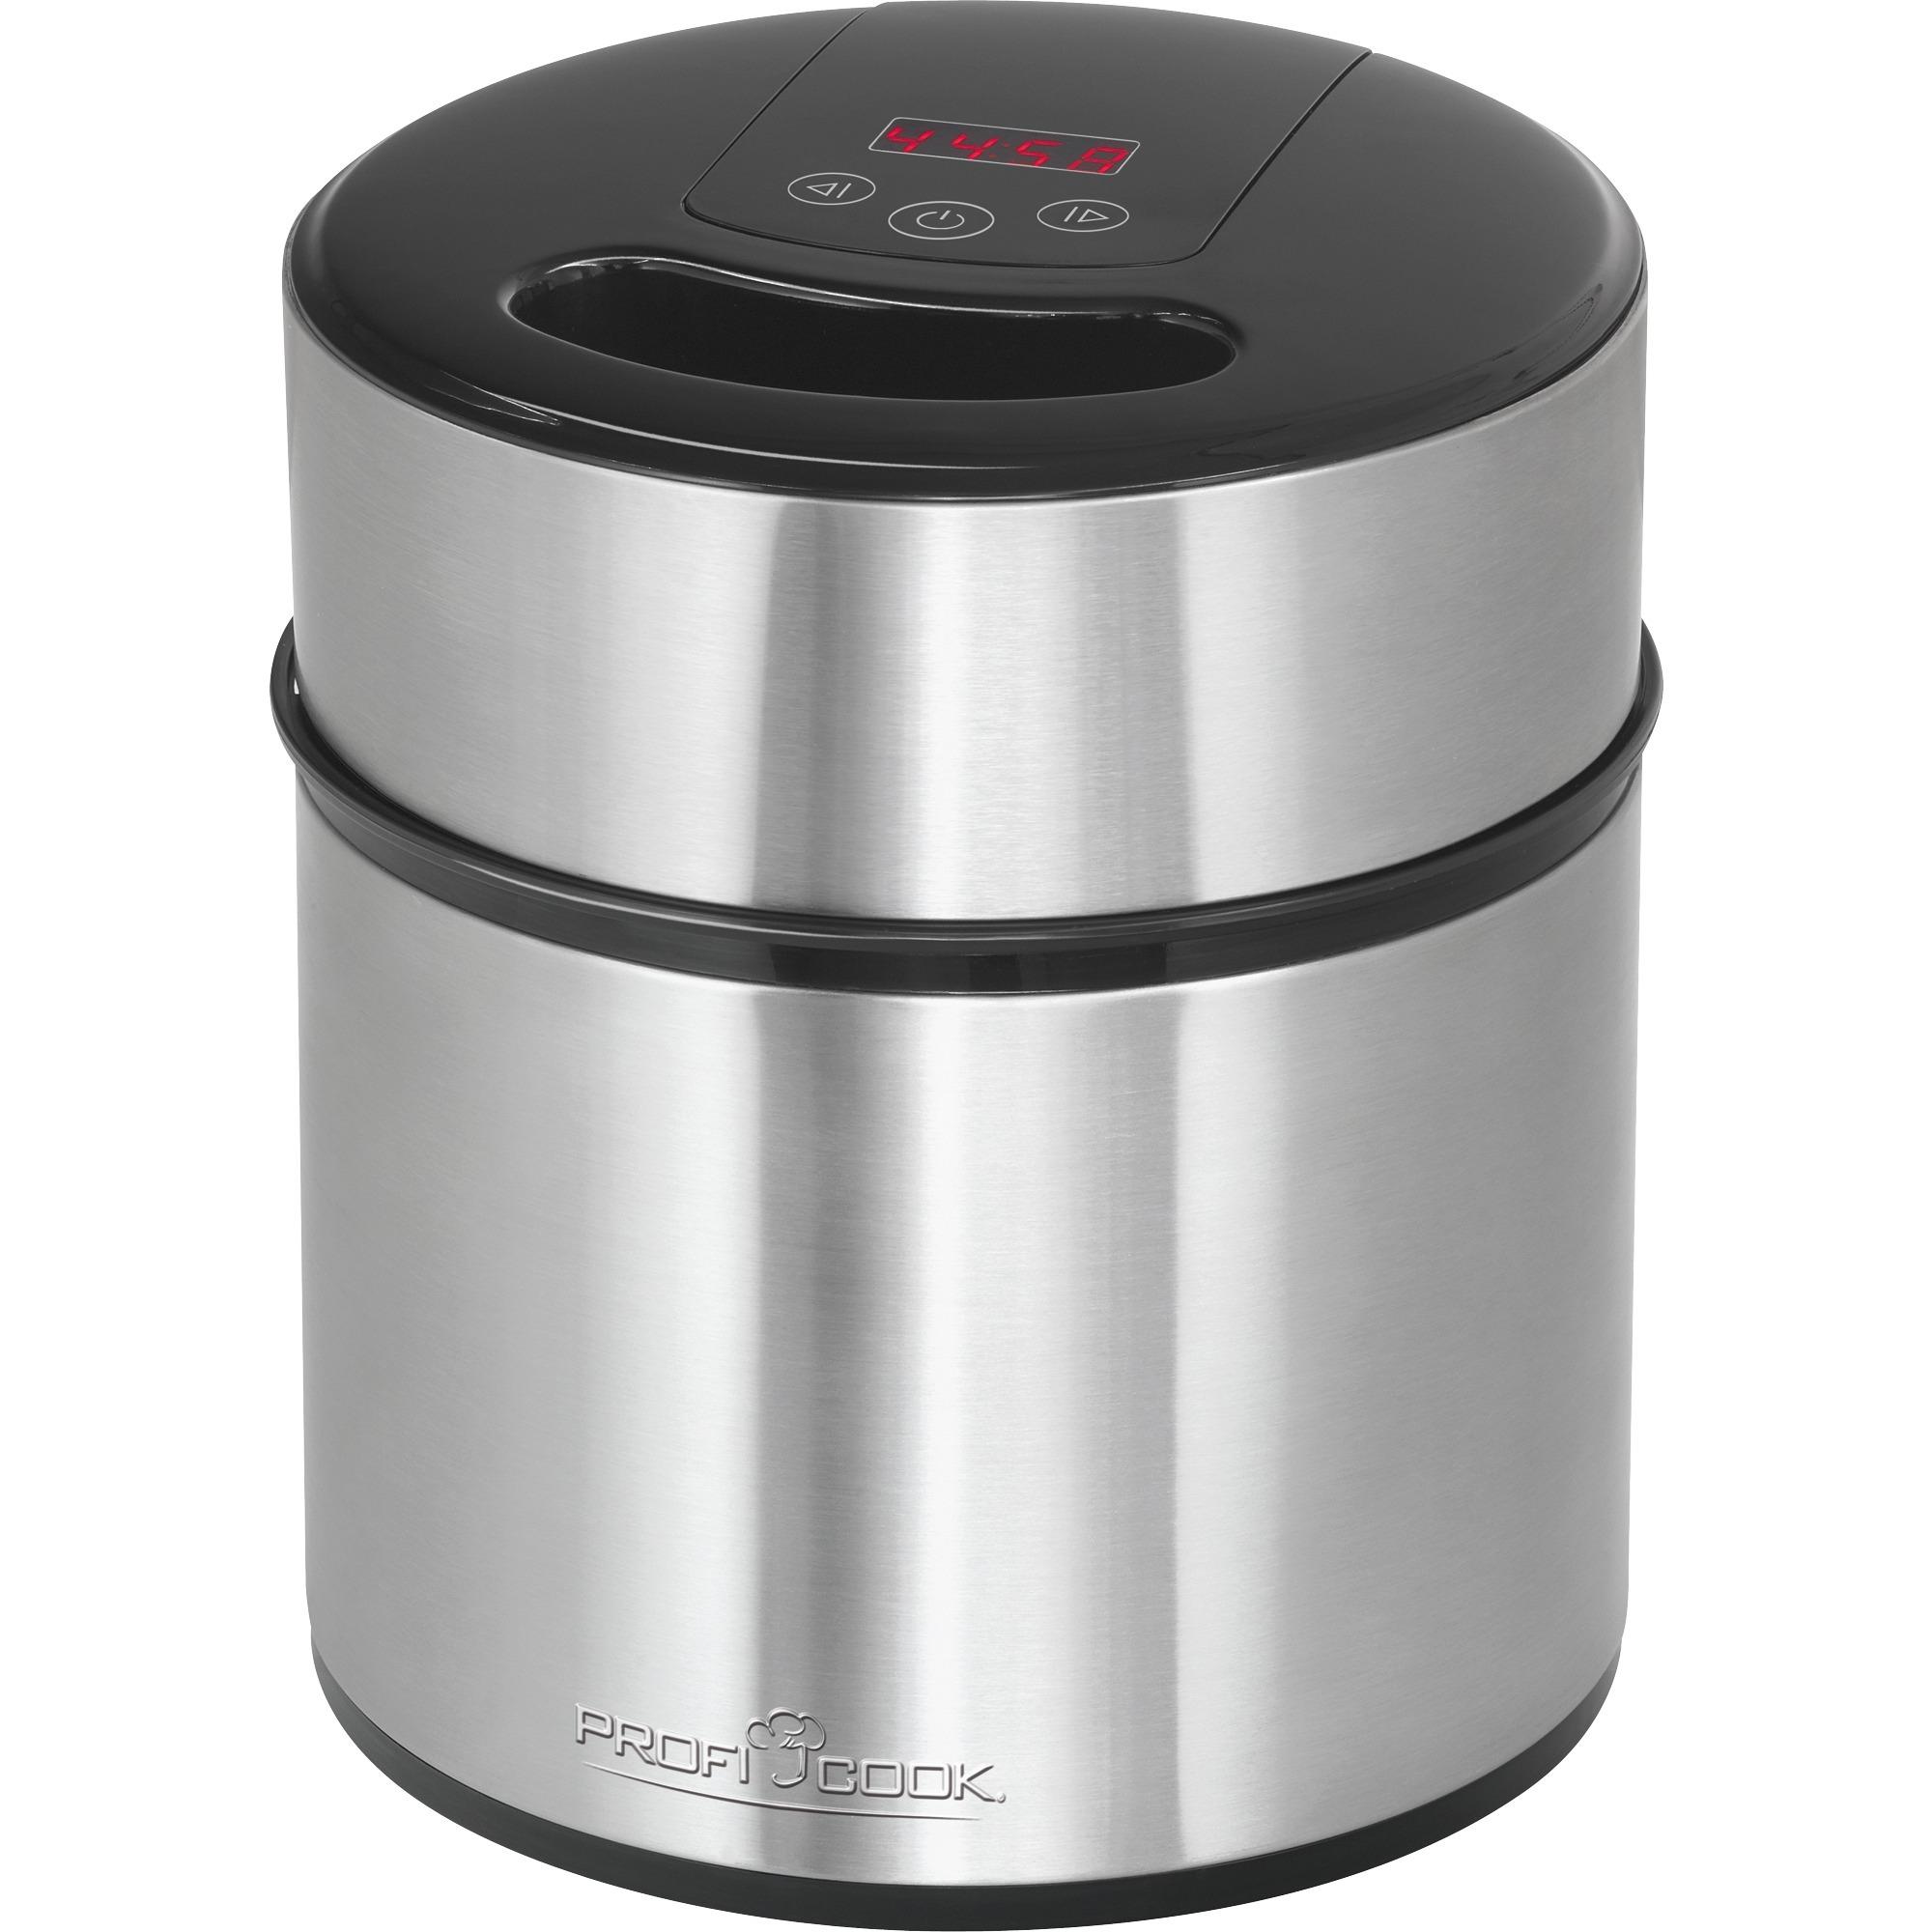 501140 máquina para helados 1,8 L Negro, Acero inoxidable 12 W, Heladera